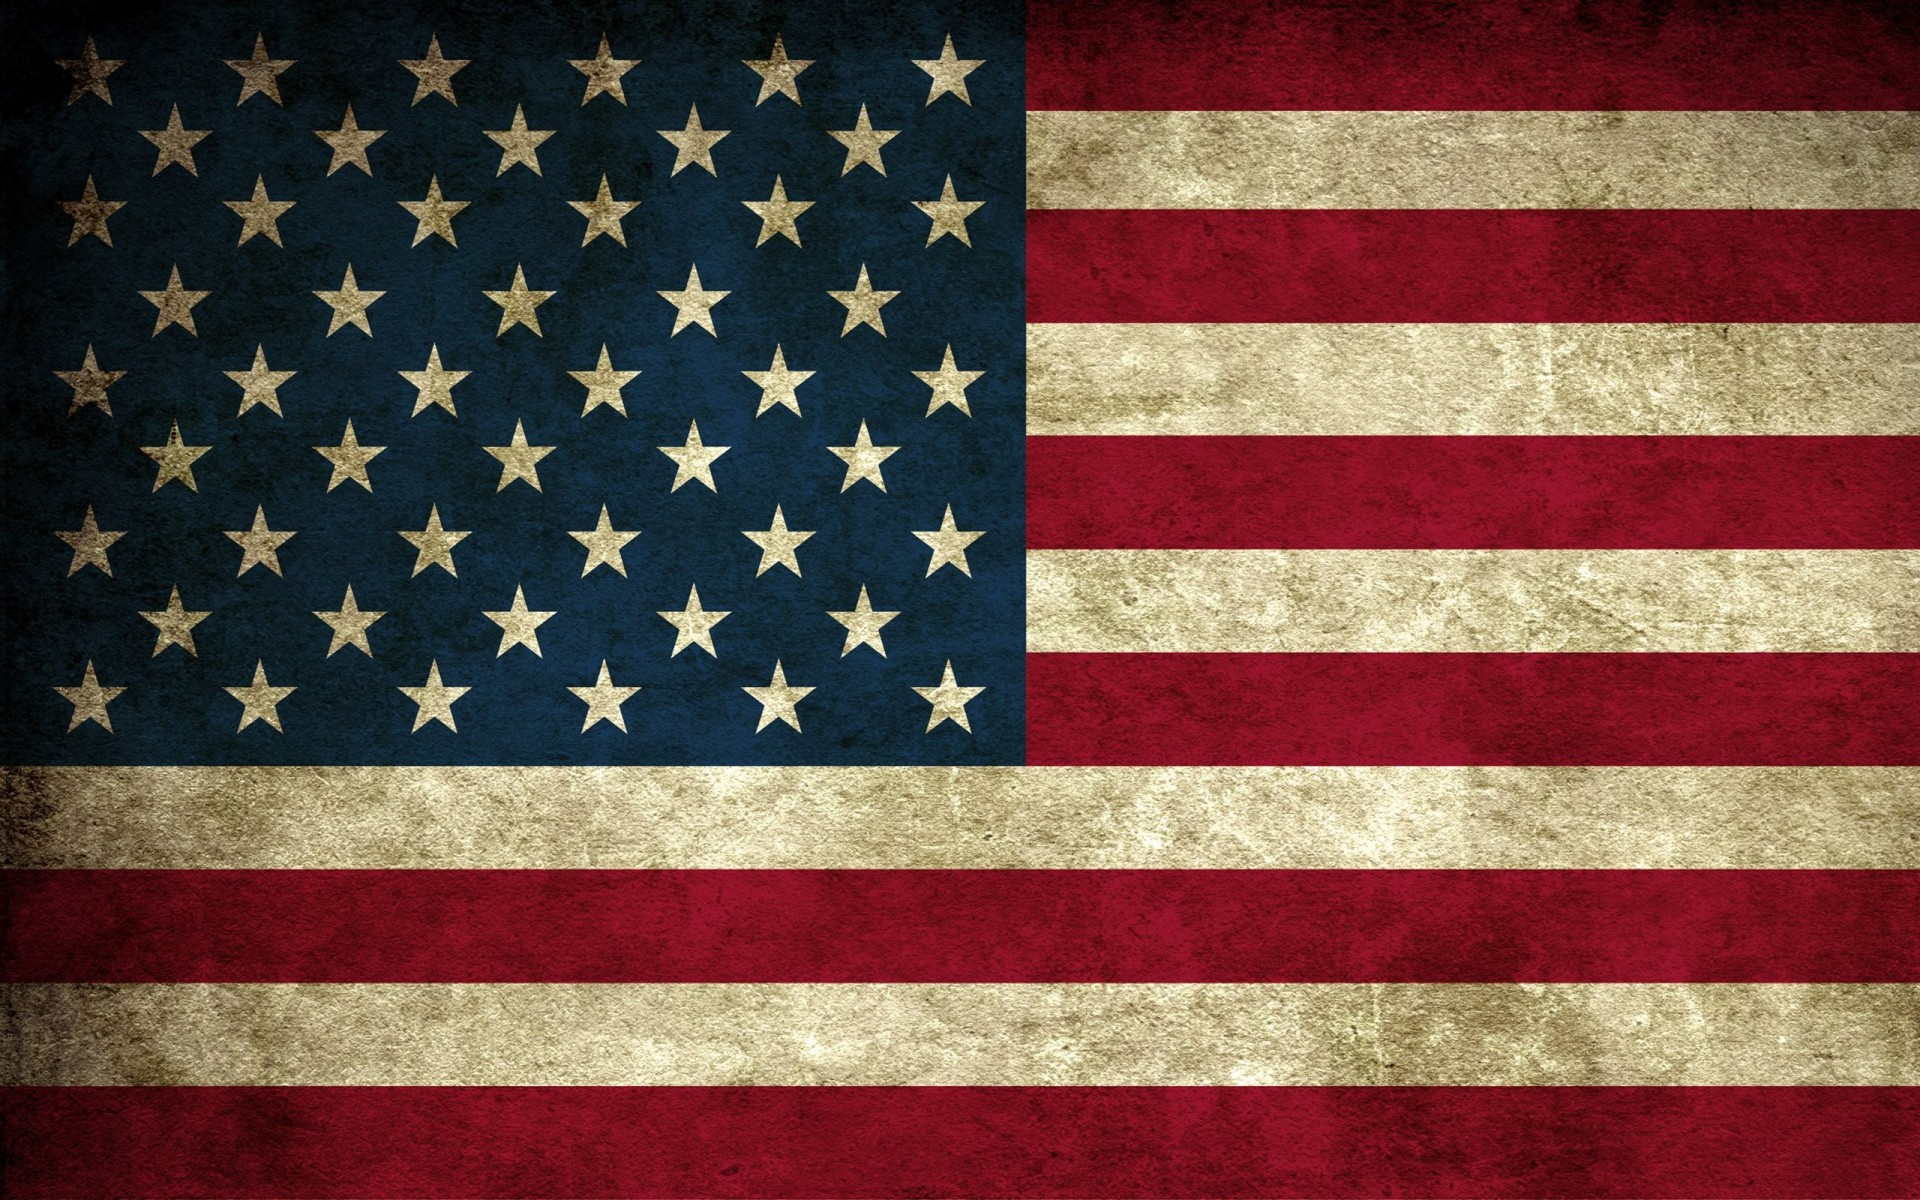 States Flag Full HD Wallpapers Download Desktop Wallpaper 1920x1200